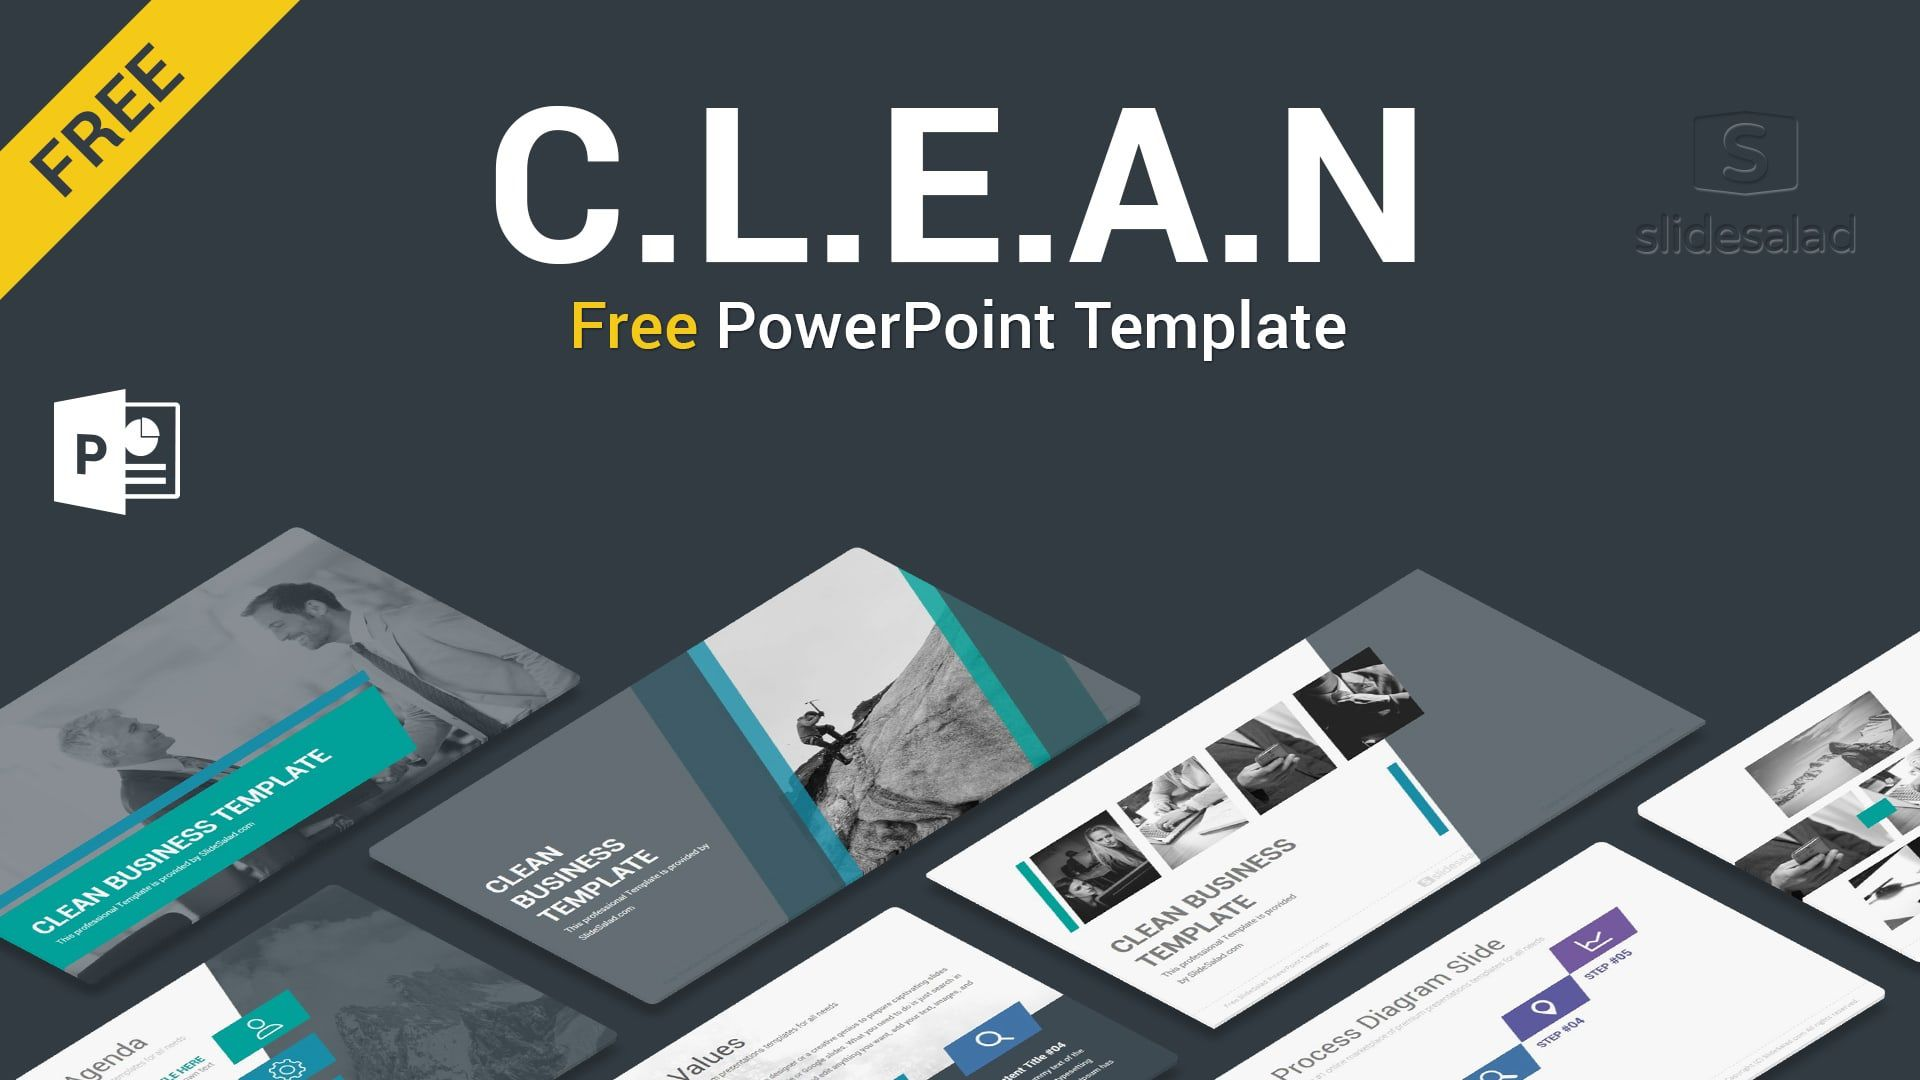 002 Wonderful Ppt Template For Seminar Presentation Free Download Image Full